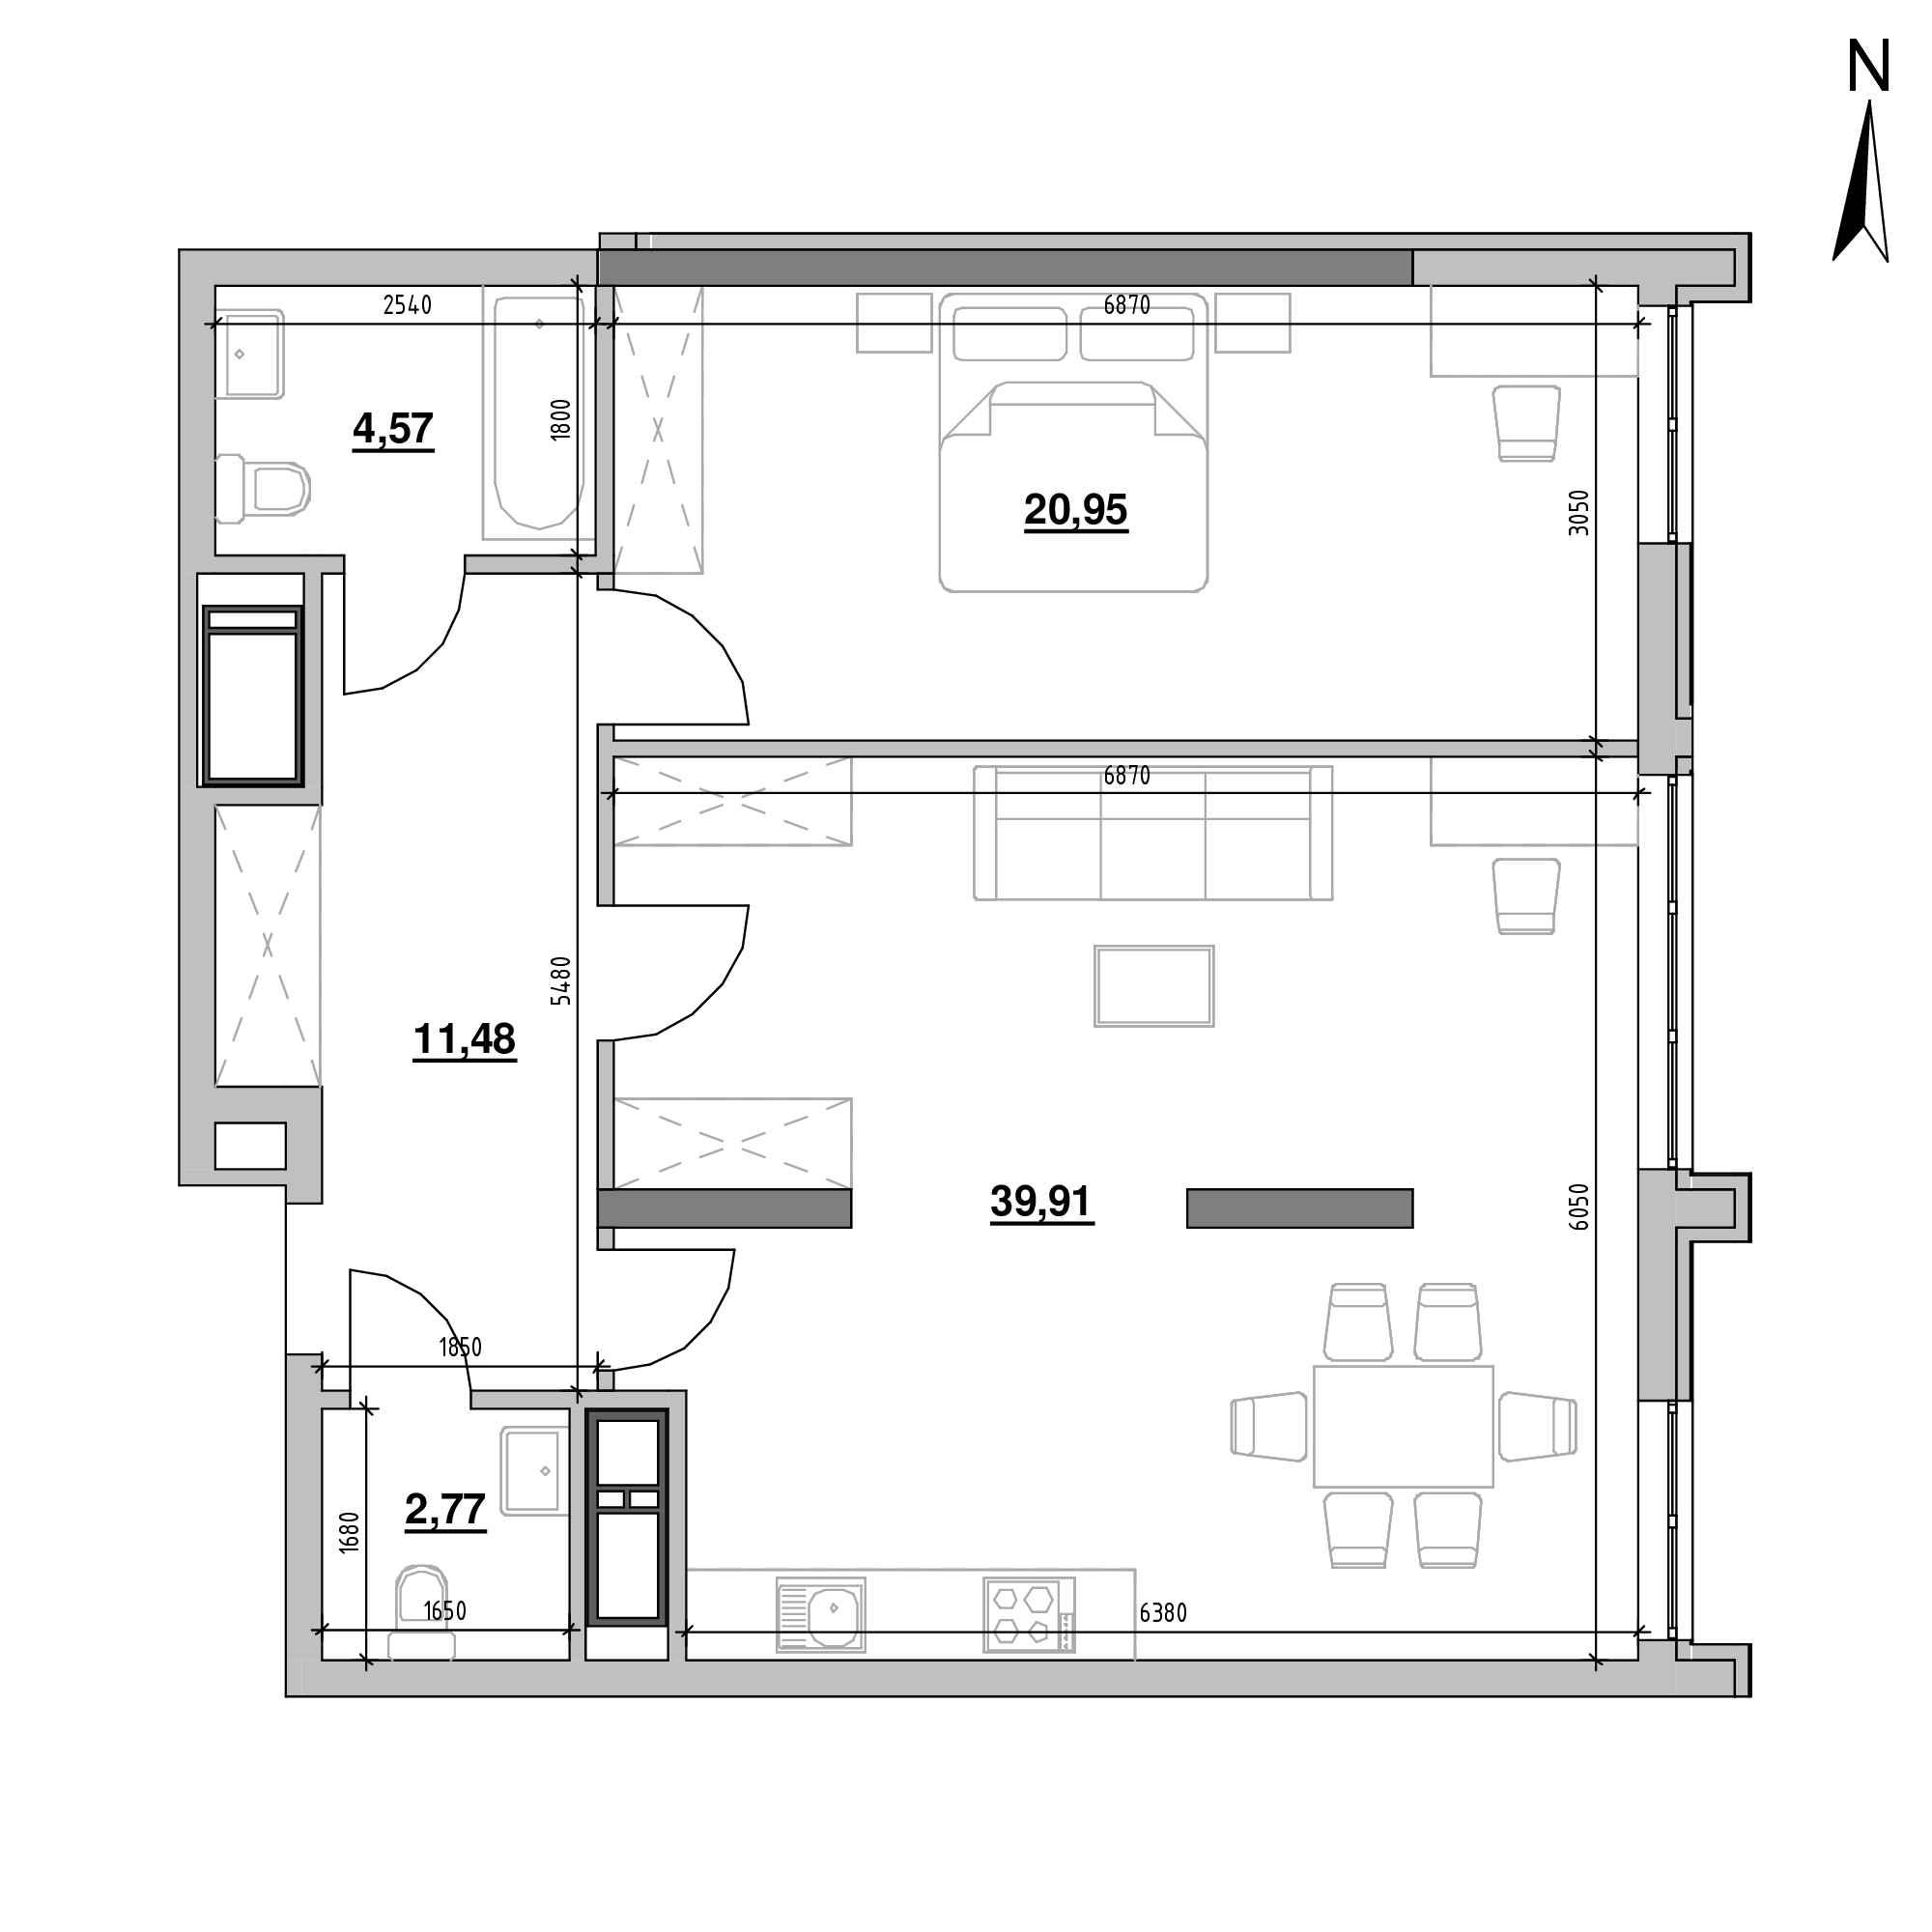 ЖК Nordica Residence: планування 1-кімнатної квартири, №170, 79.68 м<sup>2</sup>